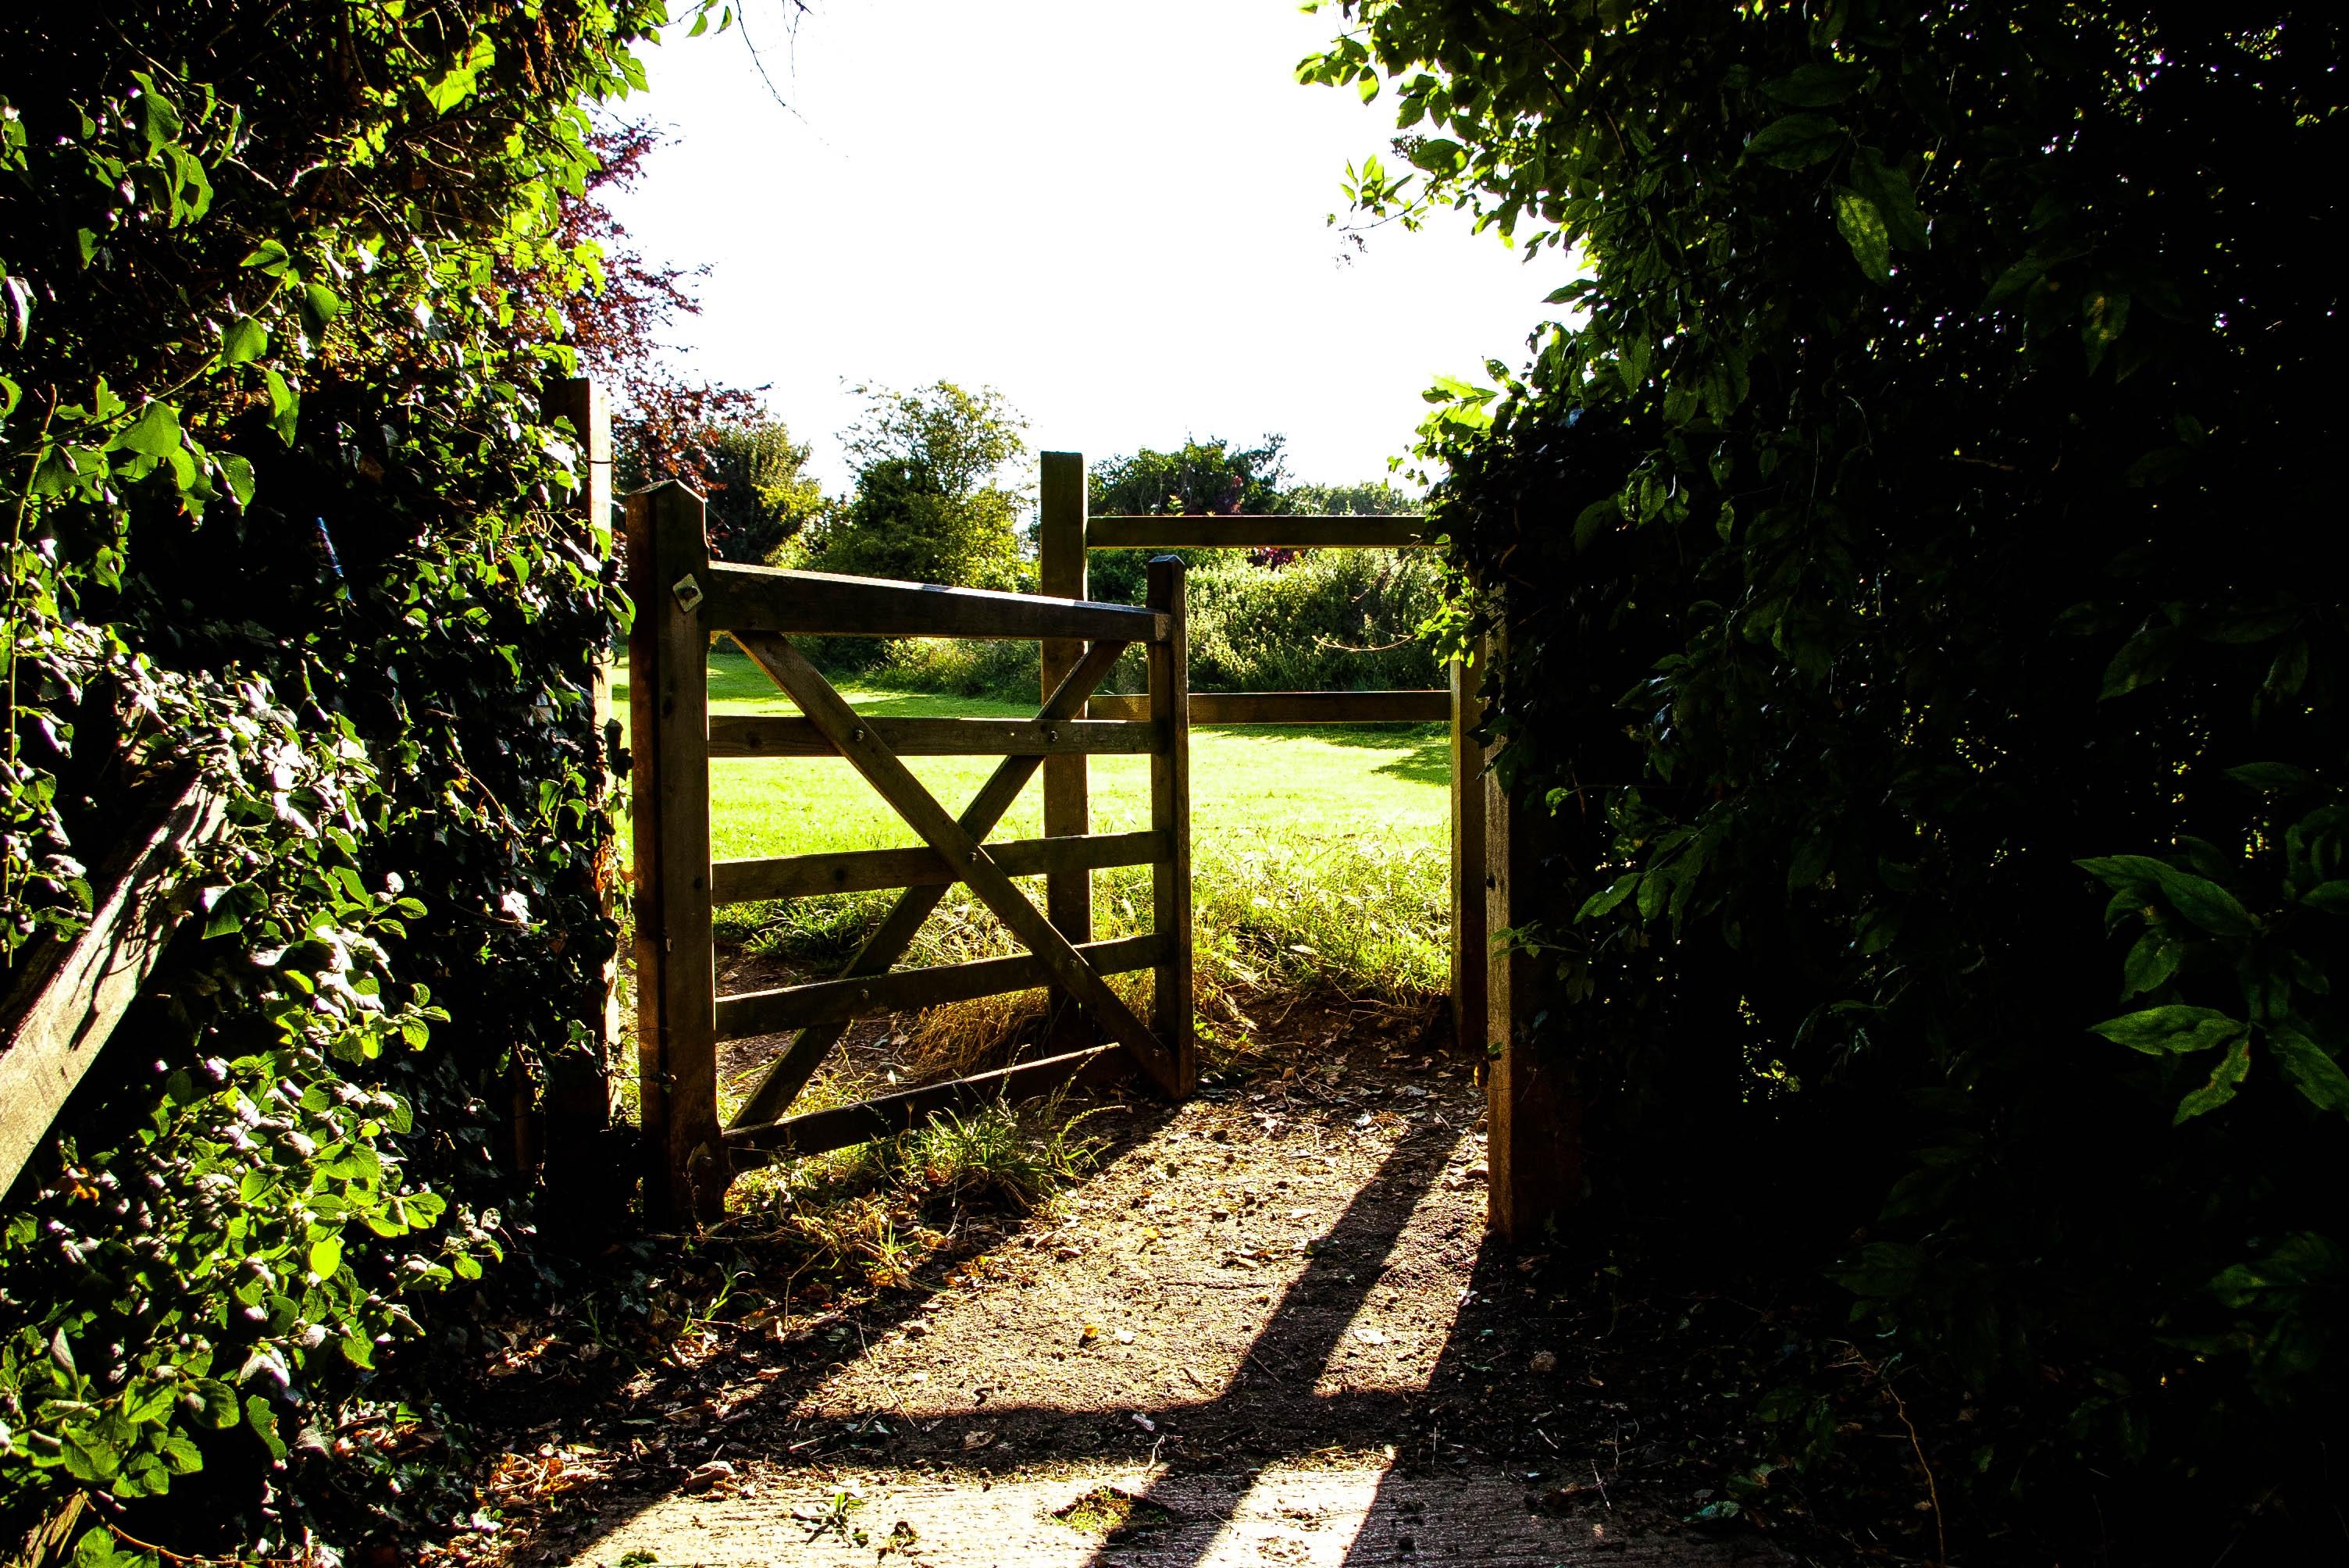 ... Landscape, Nature, Forest, Grass, Open, Fence, Trail, Field, Lawn,  Meadow, Sunlight, Green, Jungle, Scenic, Entrance, Cottage, Backyard, Garden,  Gate, ...